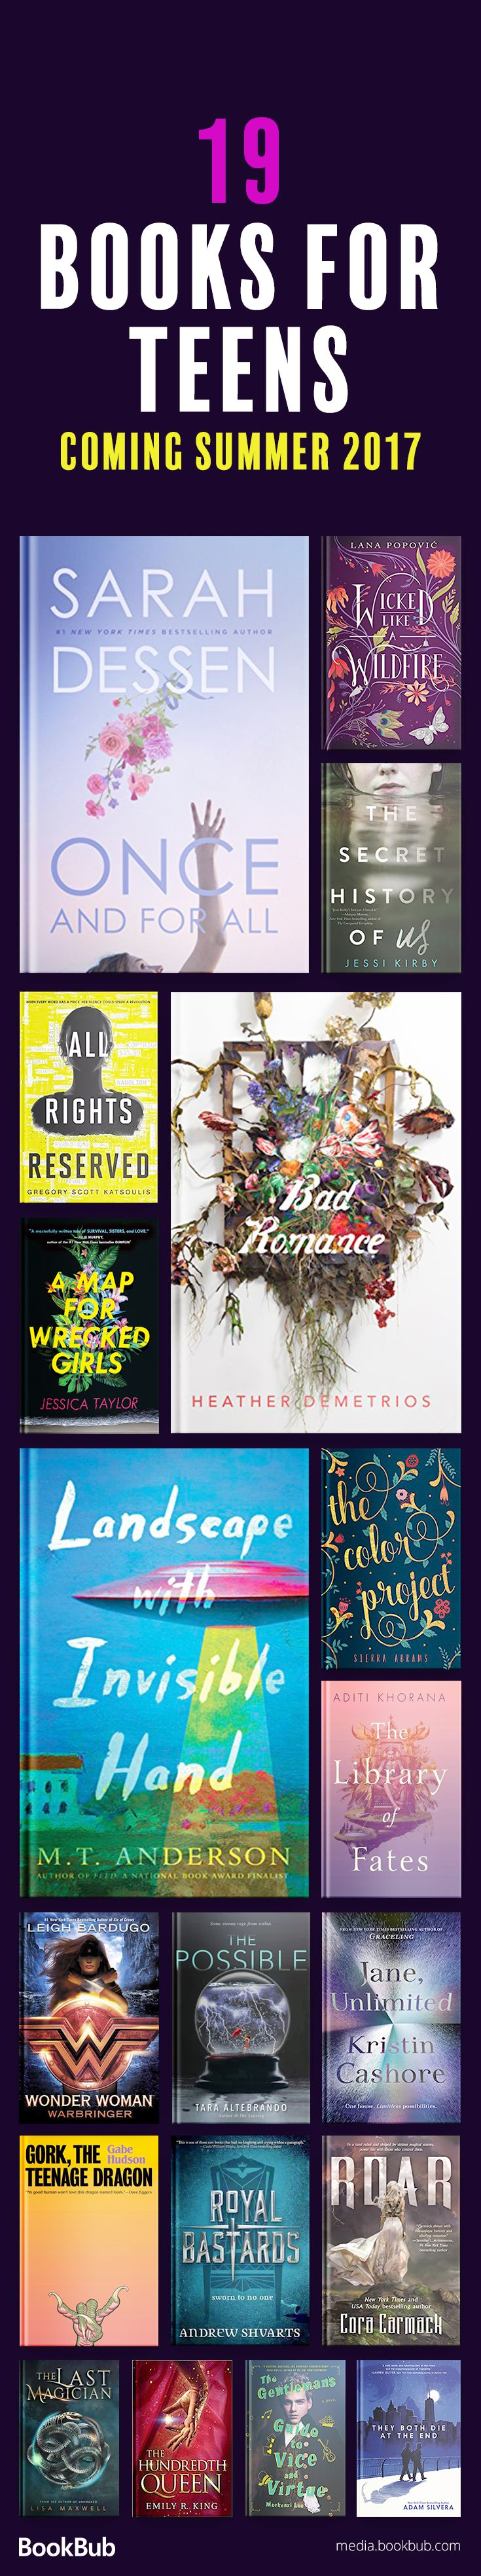 Best 25 Book tv ideas on Pinterest